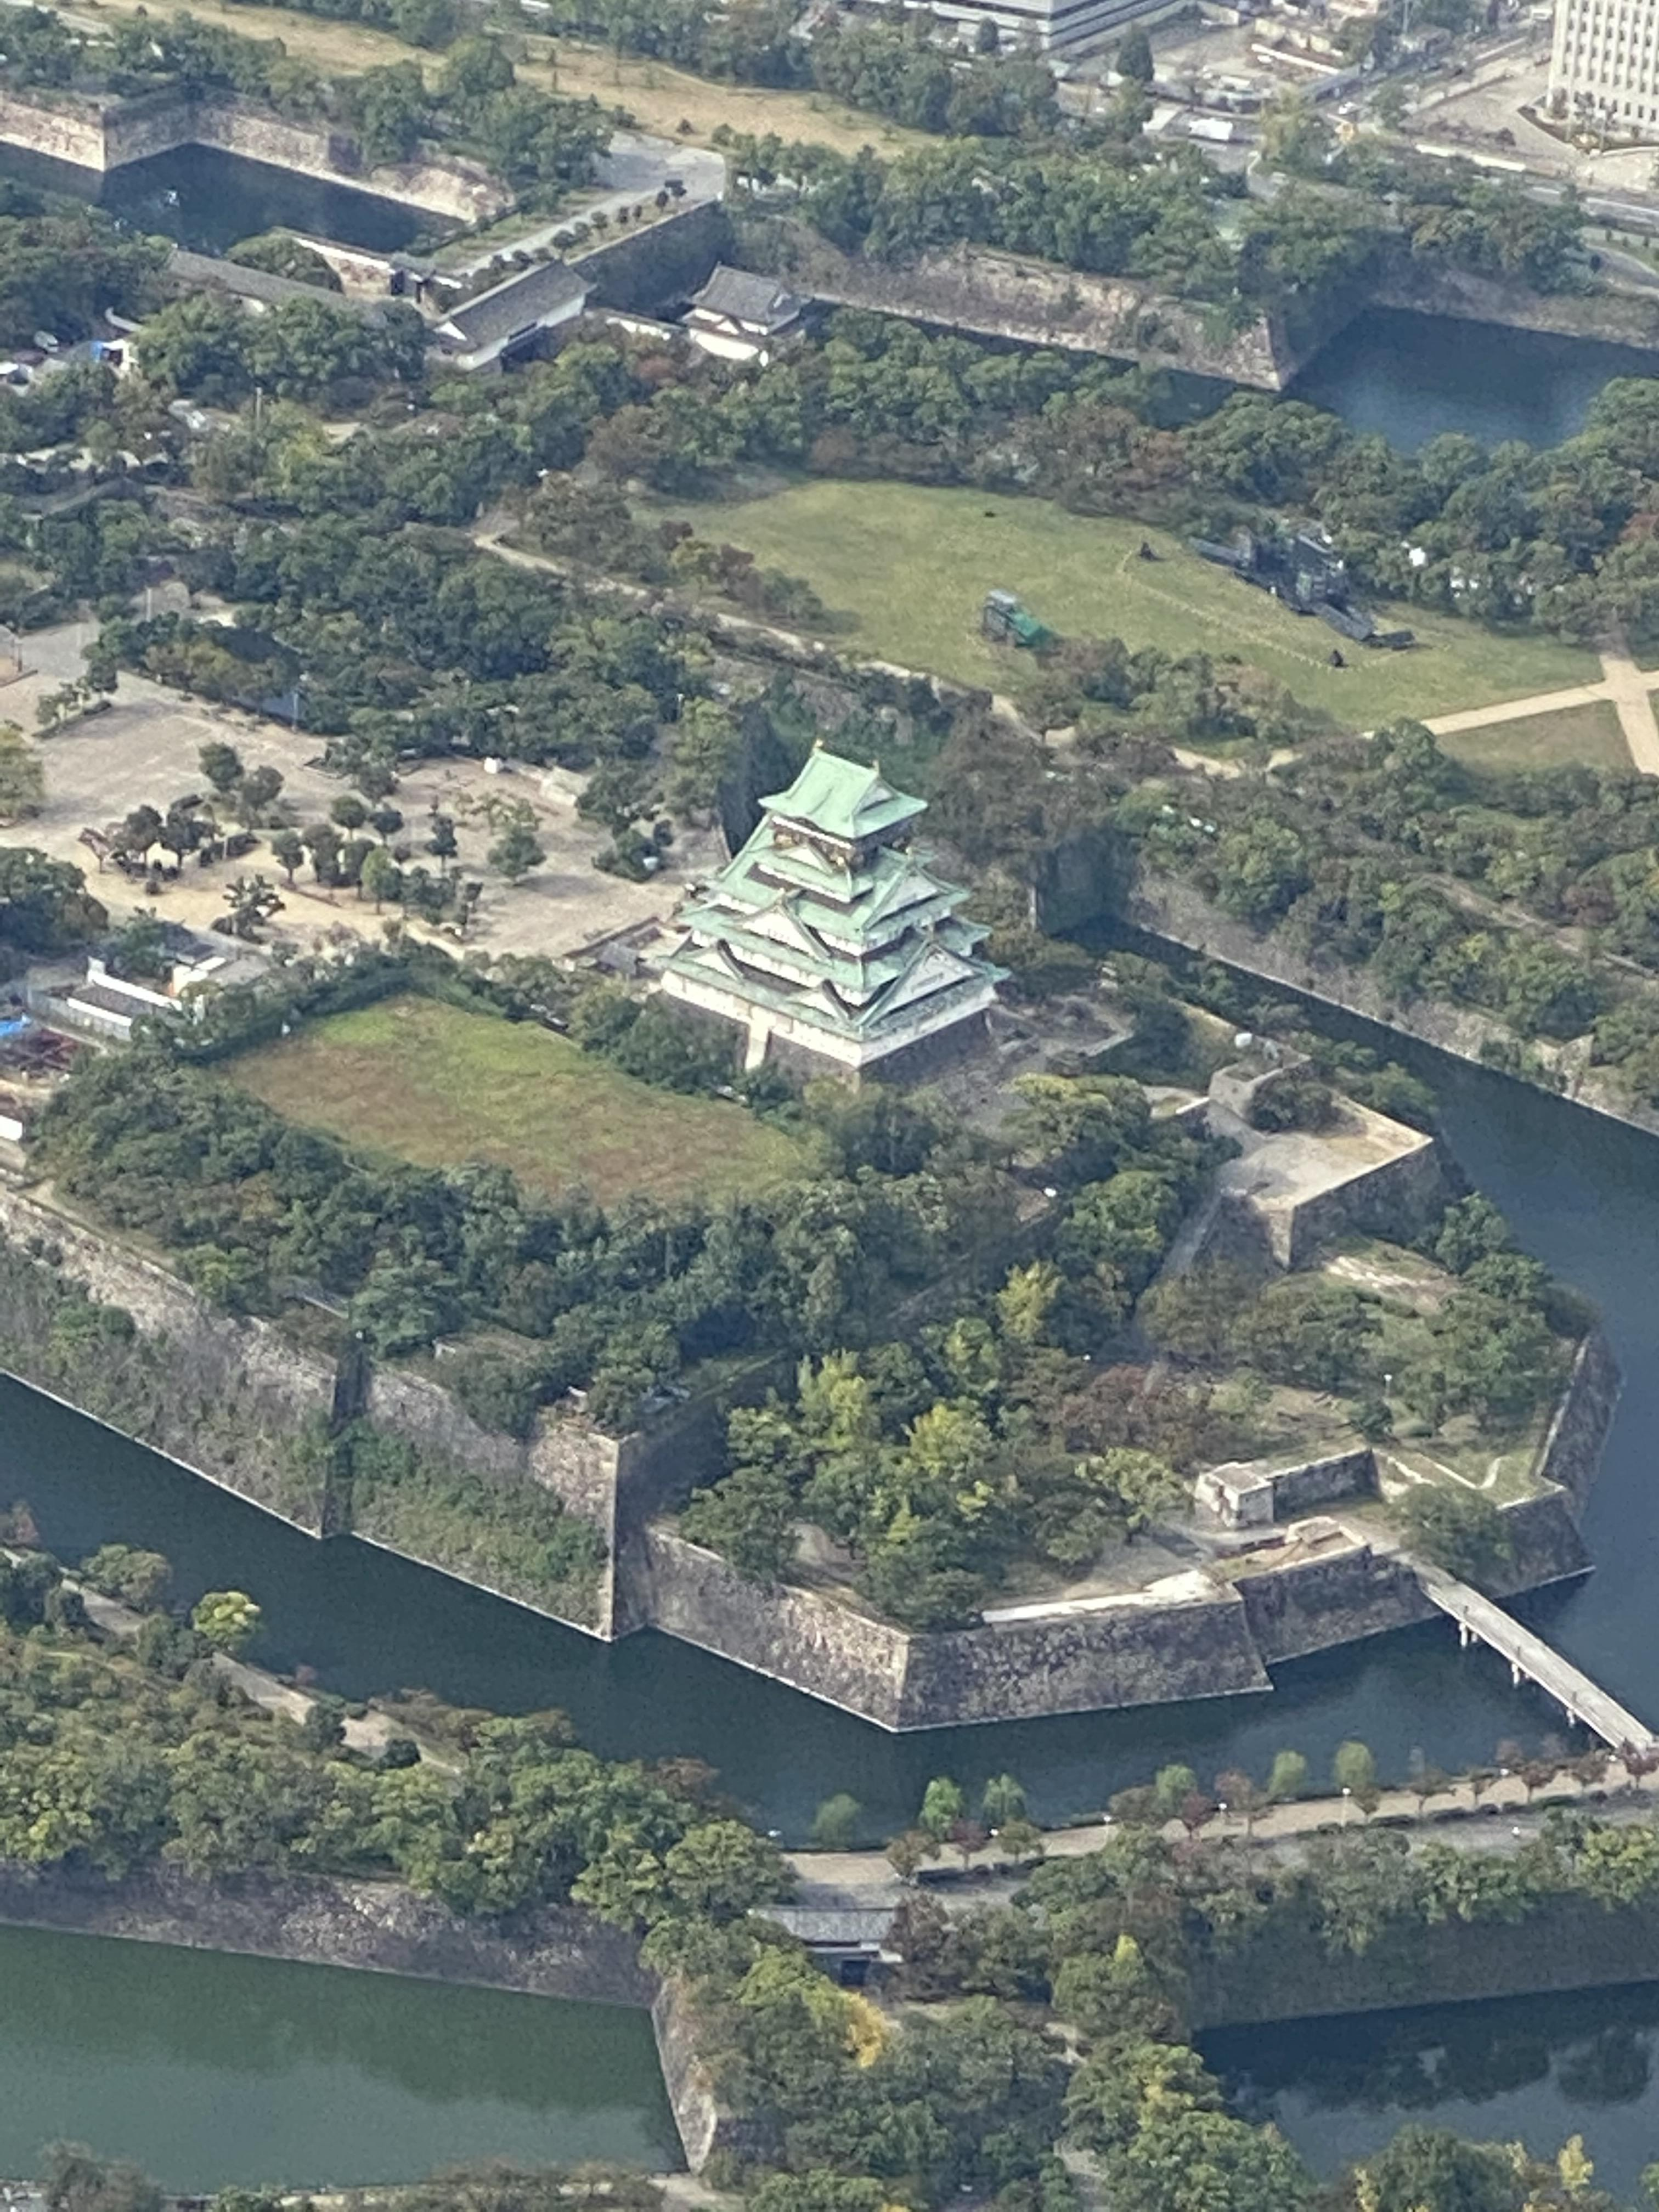 https://shikoku.misawa.co.jp/area_kouchi/54431b6dbb3c4844e0b79a1a078b2397c1c402f5.jpg